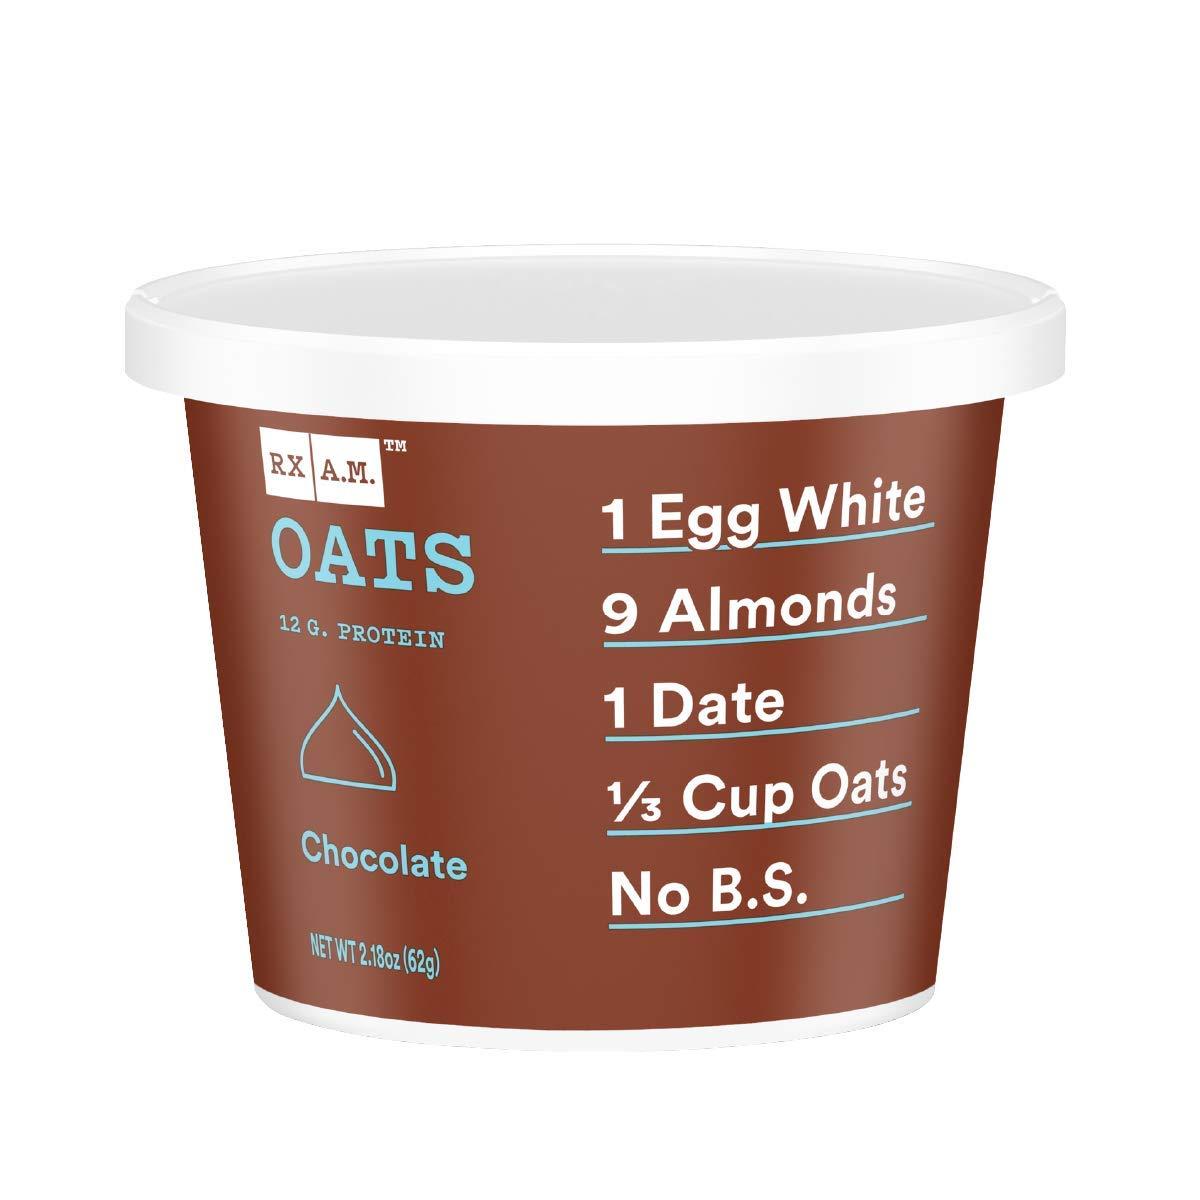 RXBAR, Rx A.M. Oats, Chocolate, 12ct, 2.18oz Cups, 12 Gluten Free Oatmeal Cups